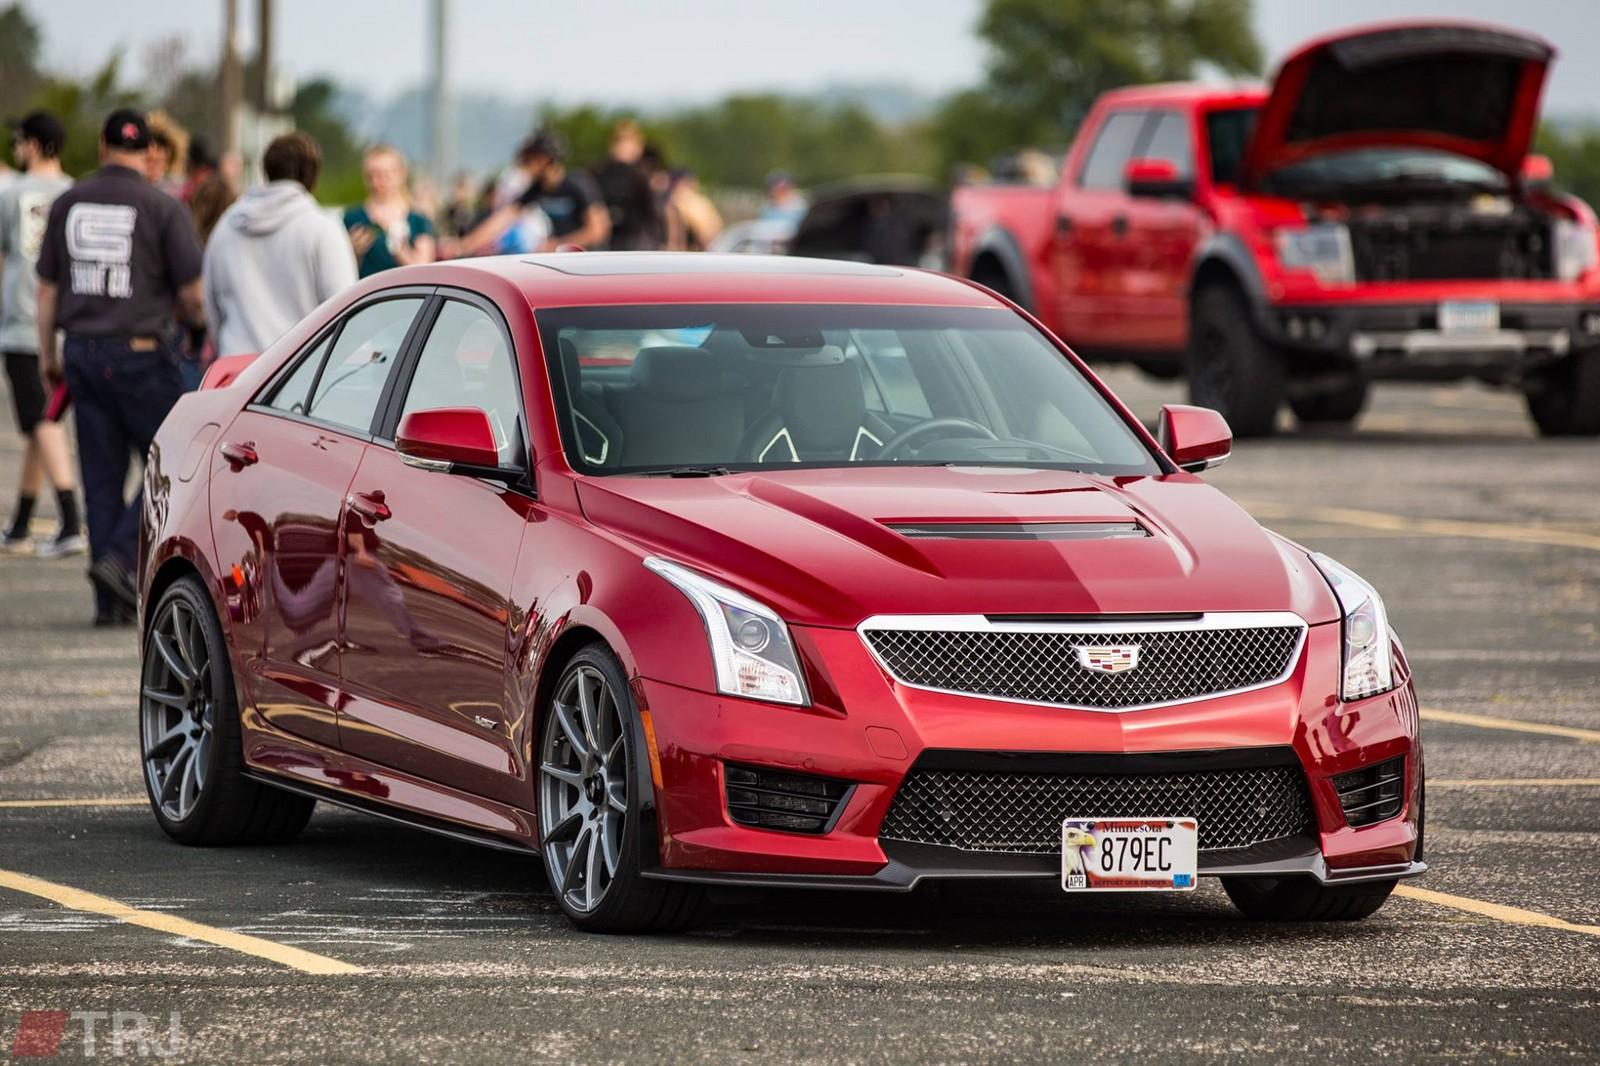 Stock 2016 Cadillac ATS-V 1/4 mile Drag Racing timeslip specs 0-60